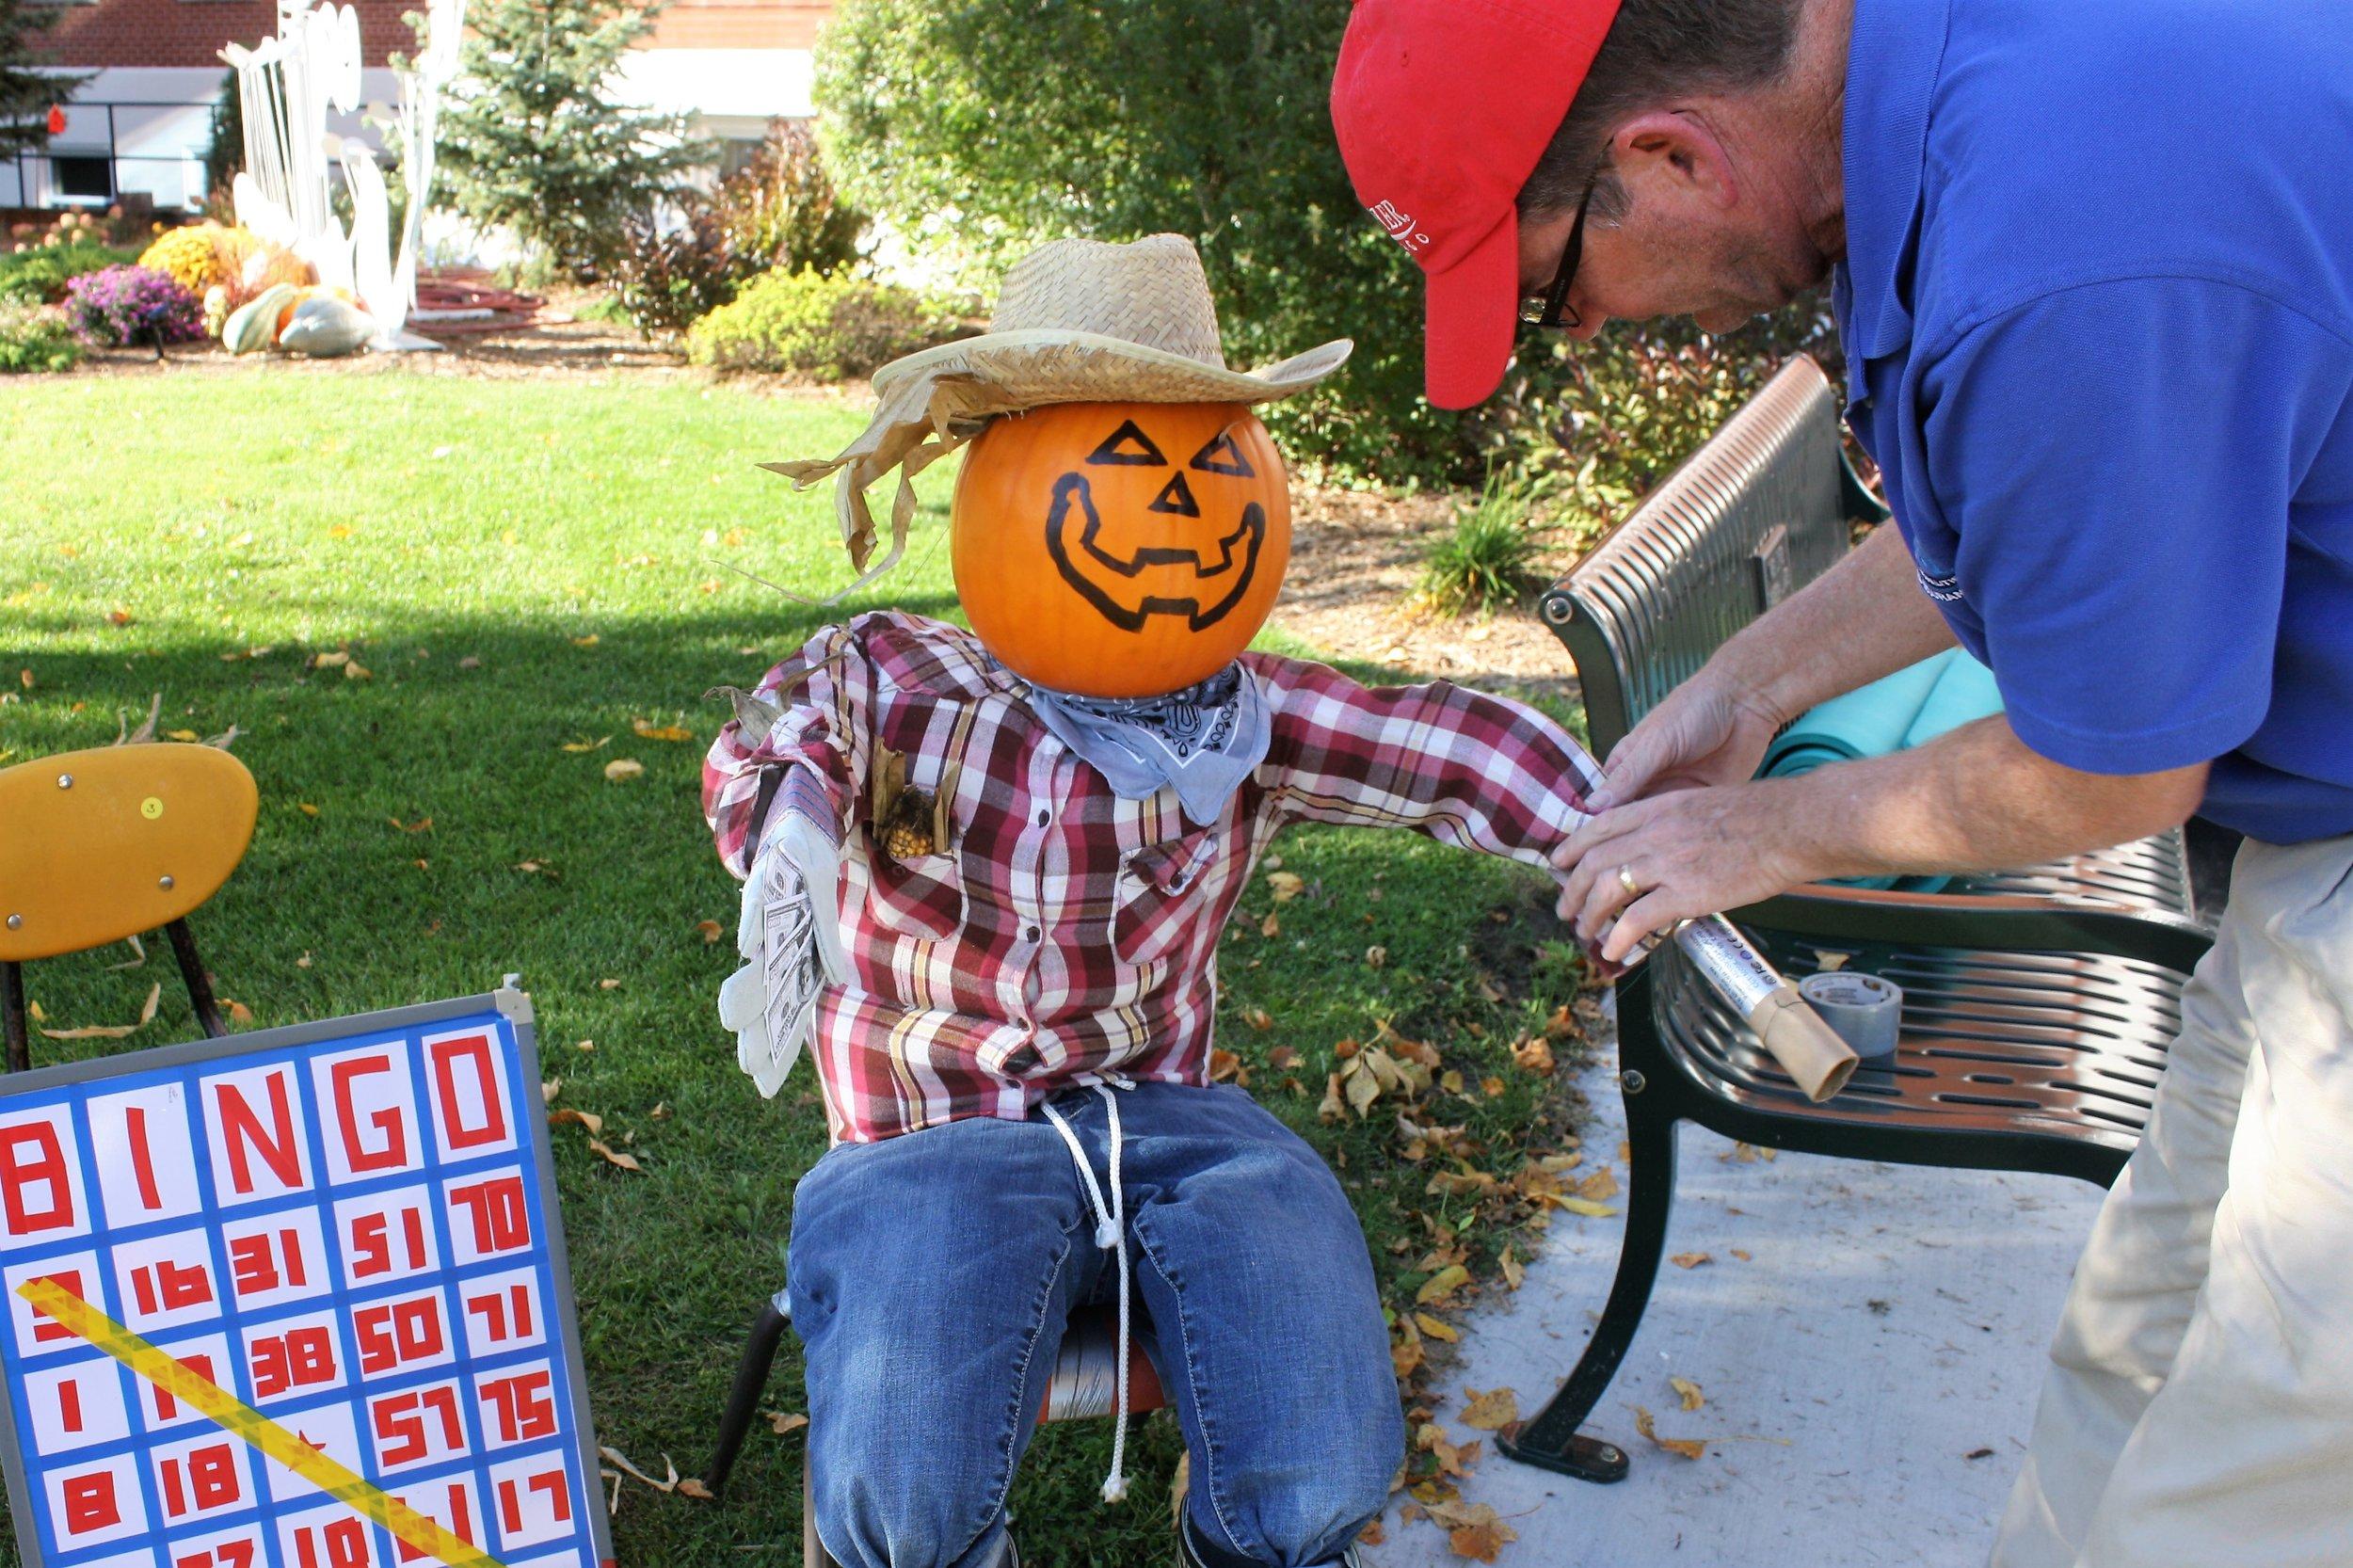 Harvest Fest Green Lake Renewal Board Member Phil Burkart prepares a Welcome Scarecrow at Harvest Fest Bingo